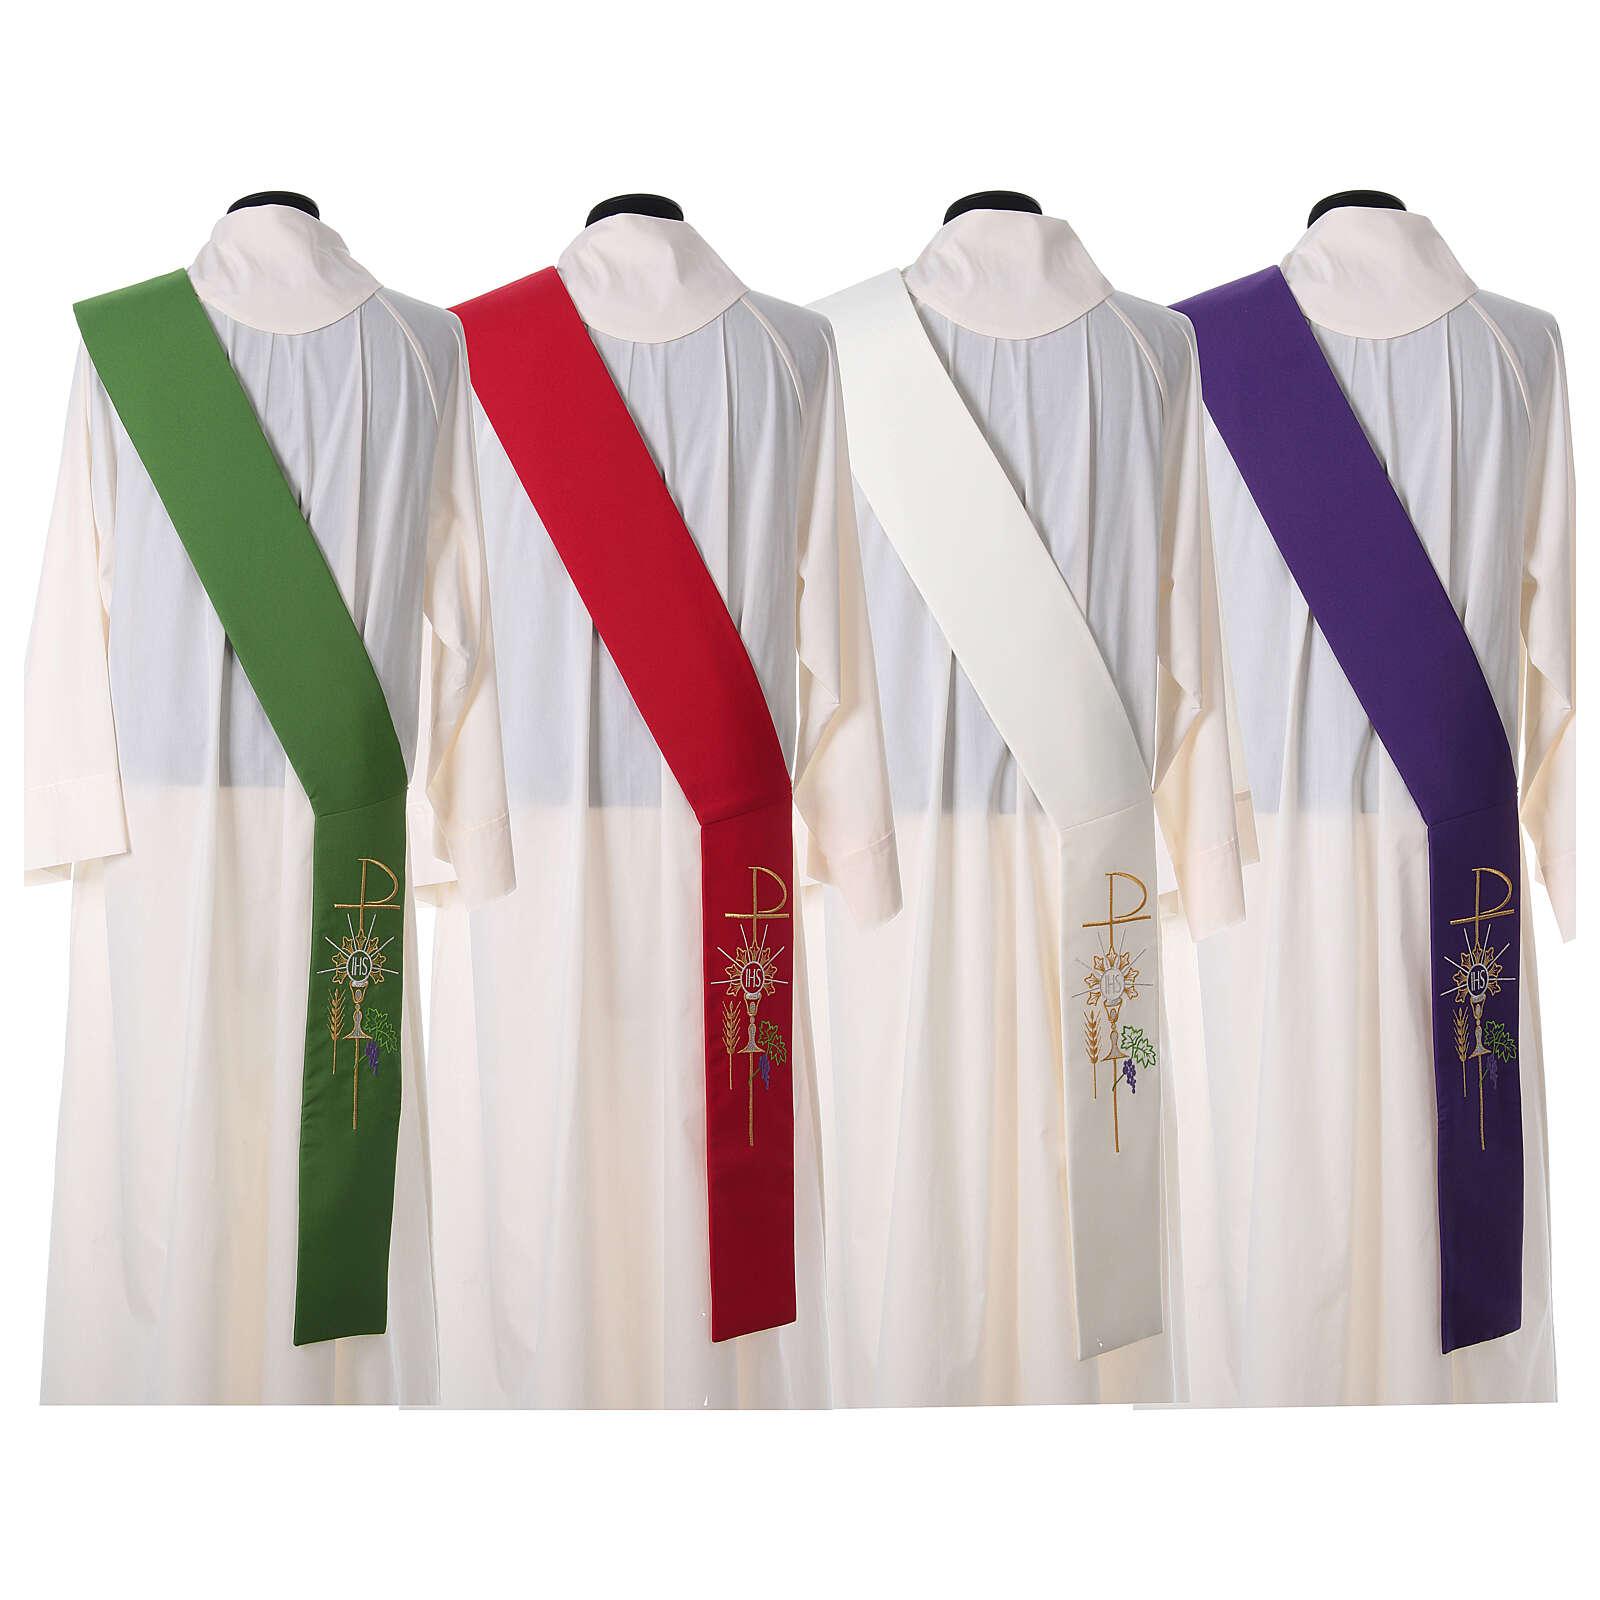 Stola diaconale 100% poliestere calice ostia uva 4